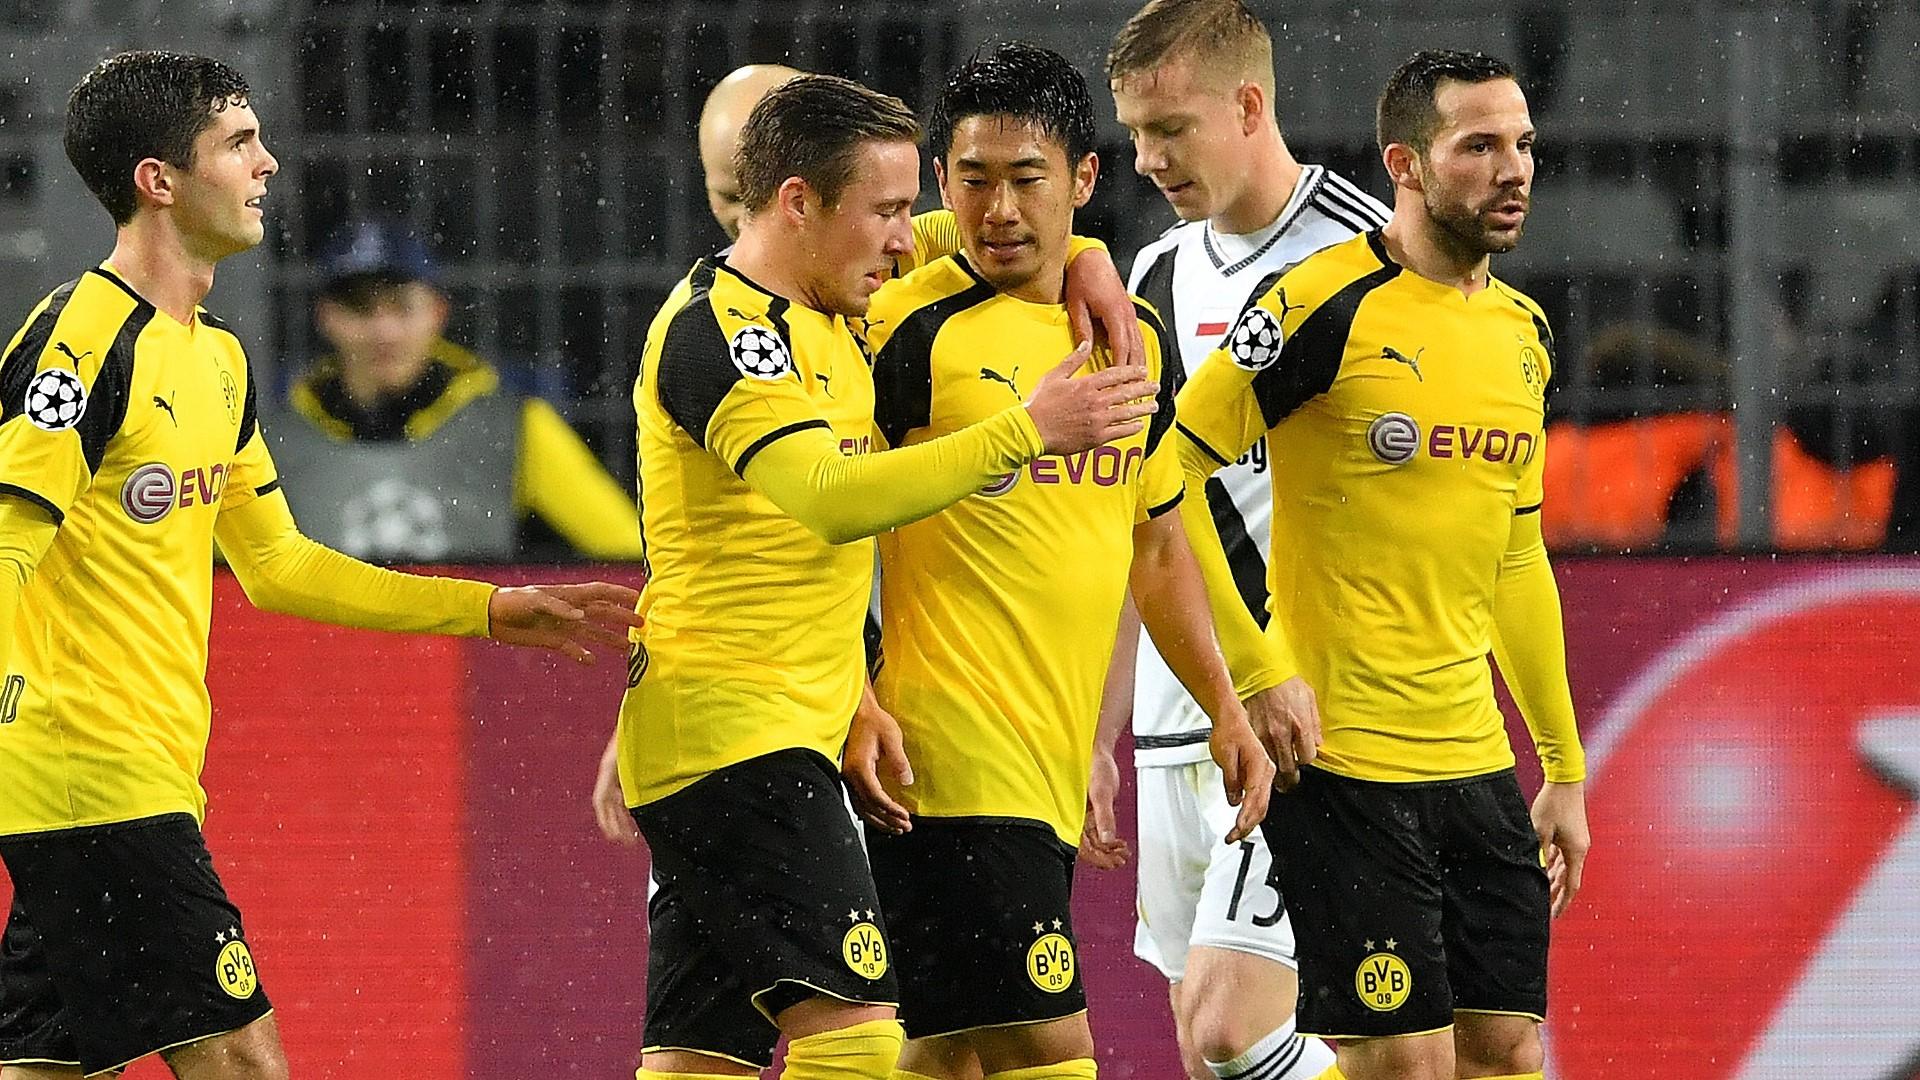 Borussia Dortmund images